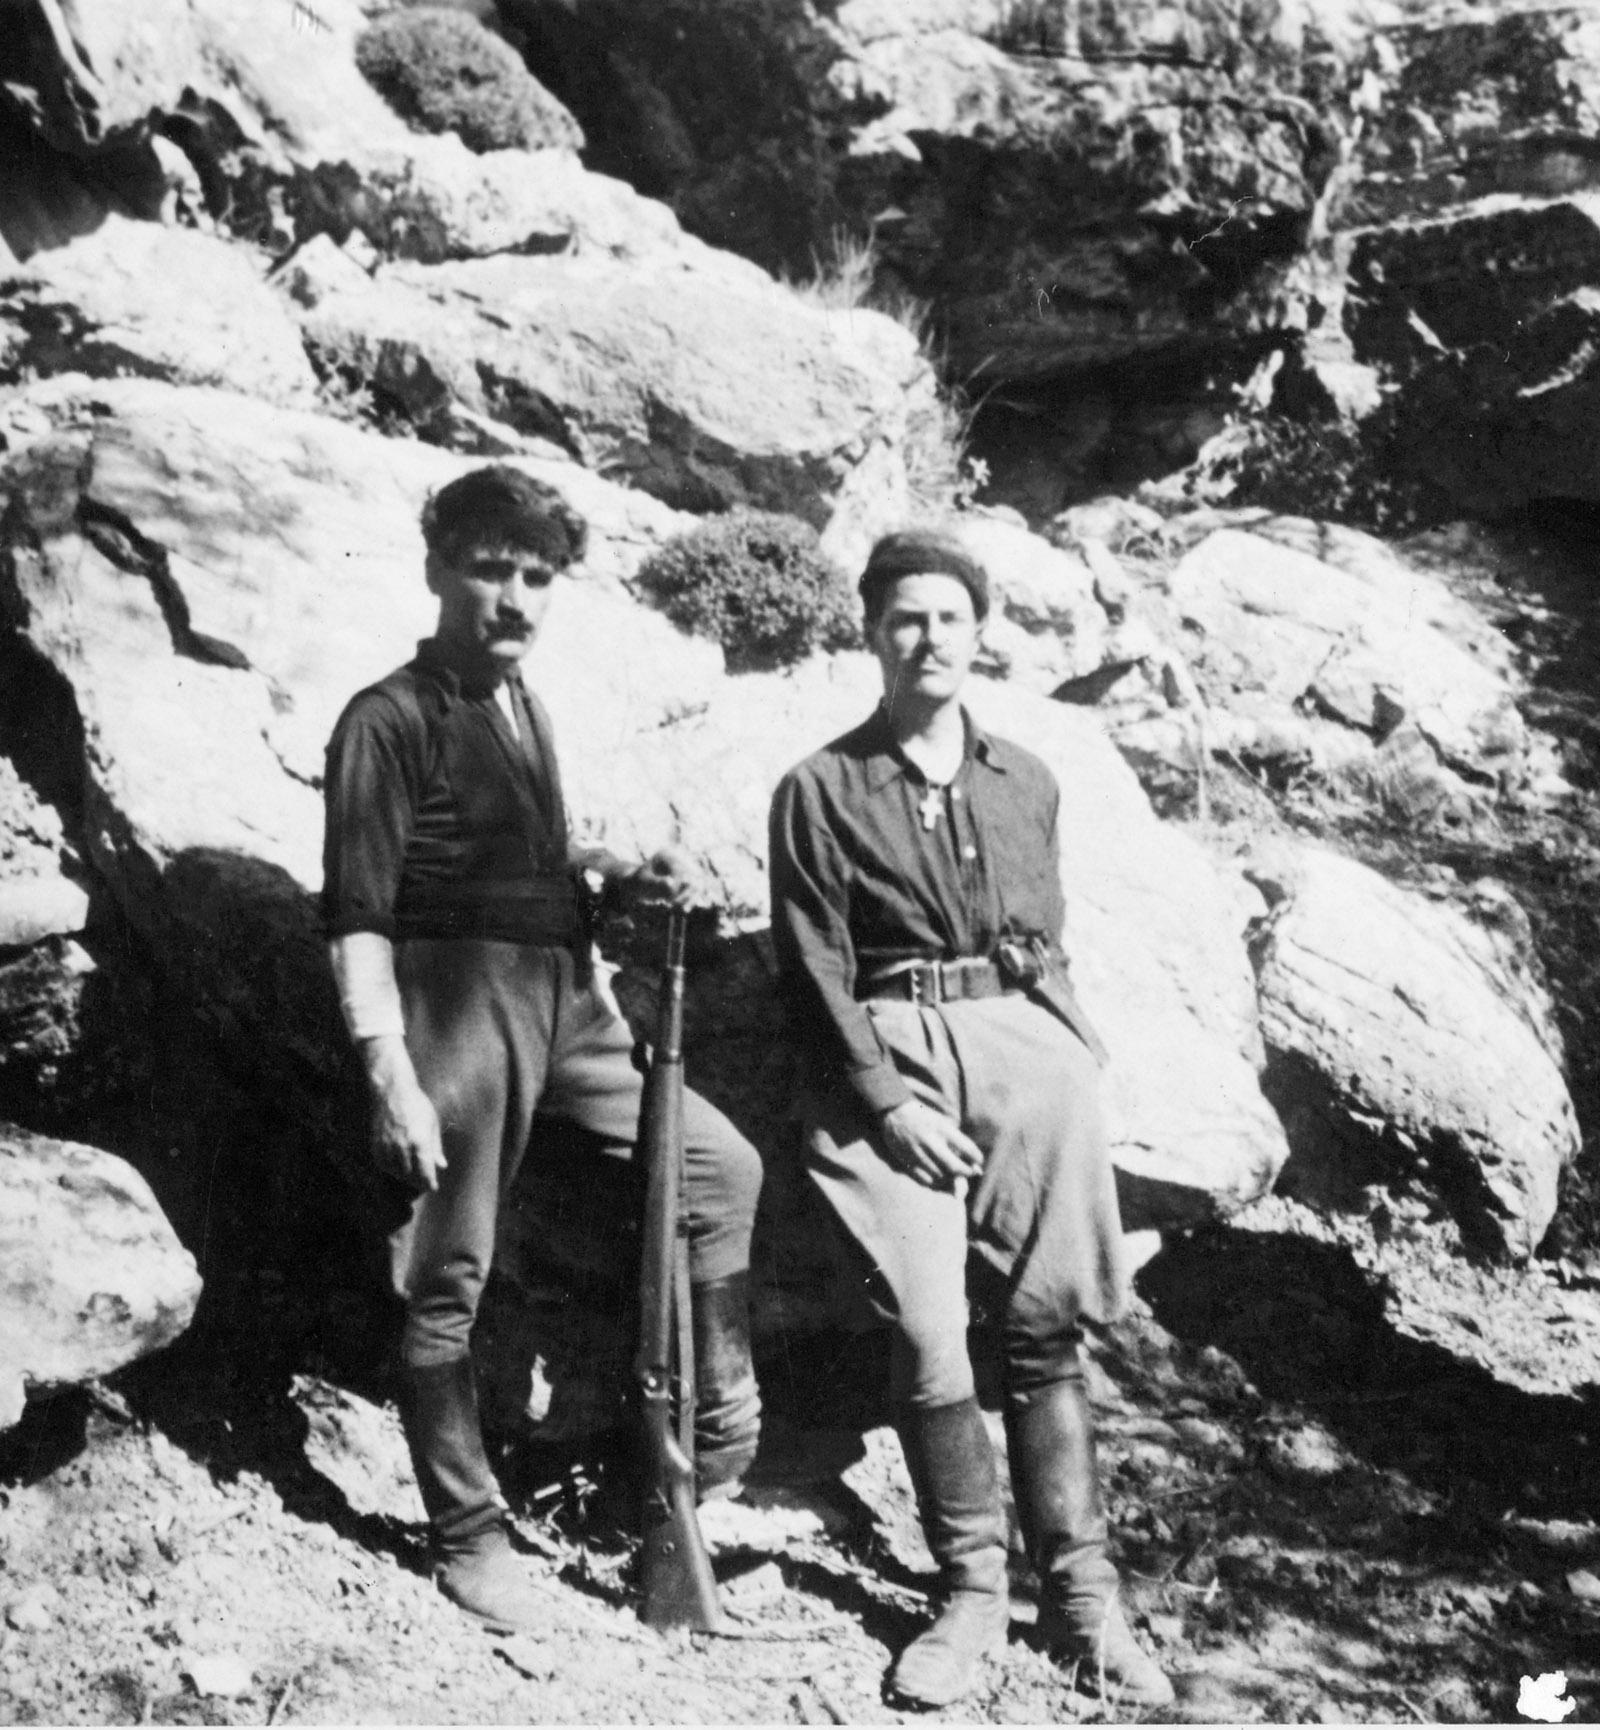 Patrick Leigh Fermor (right) and Yanni Tsangarakis, Hordaki, Crete, May 1943. Sir Patrick Leigh Fermor Archive/National Library of Scotland